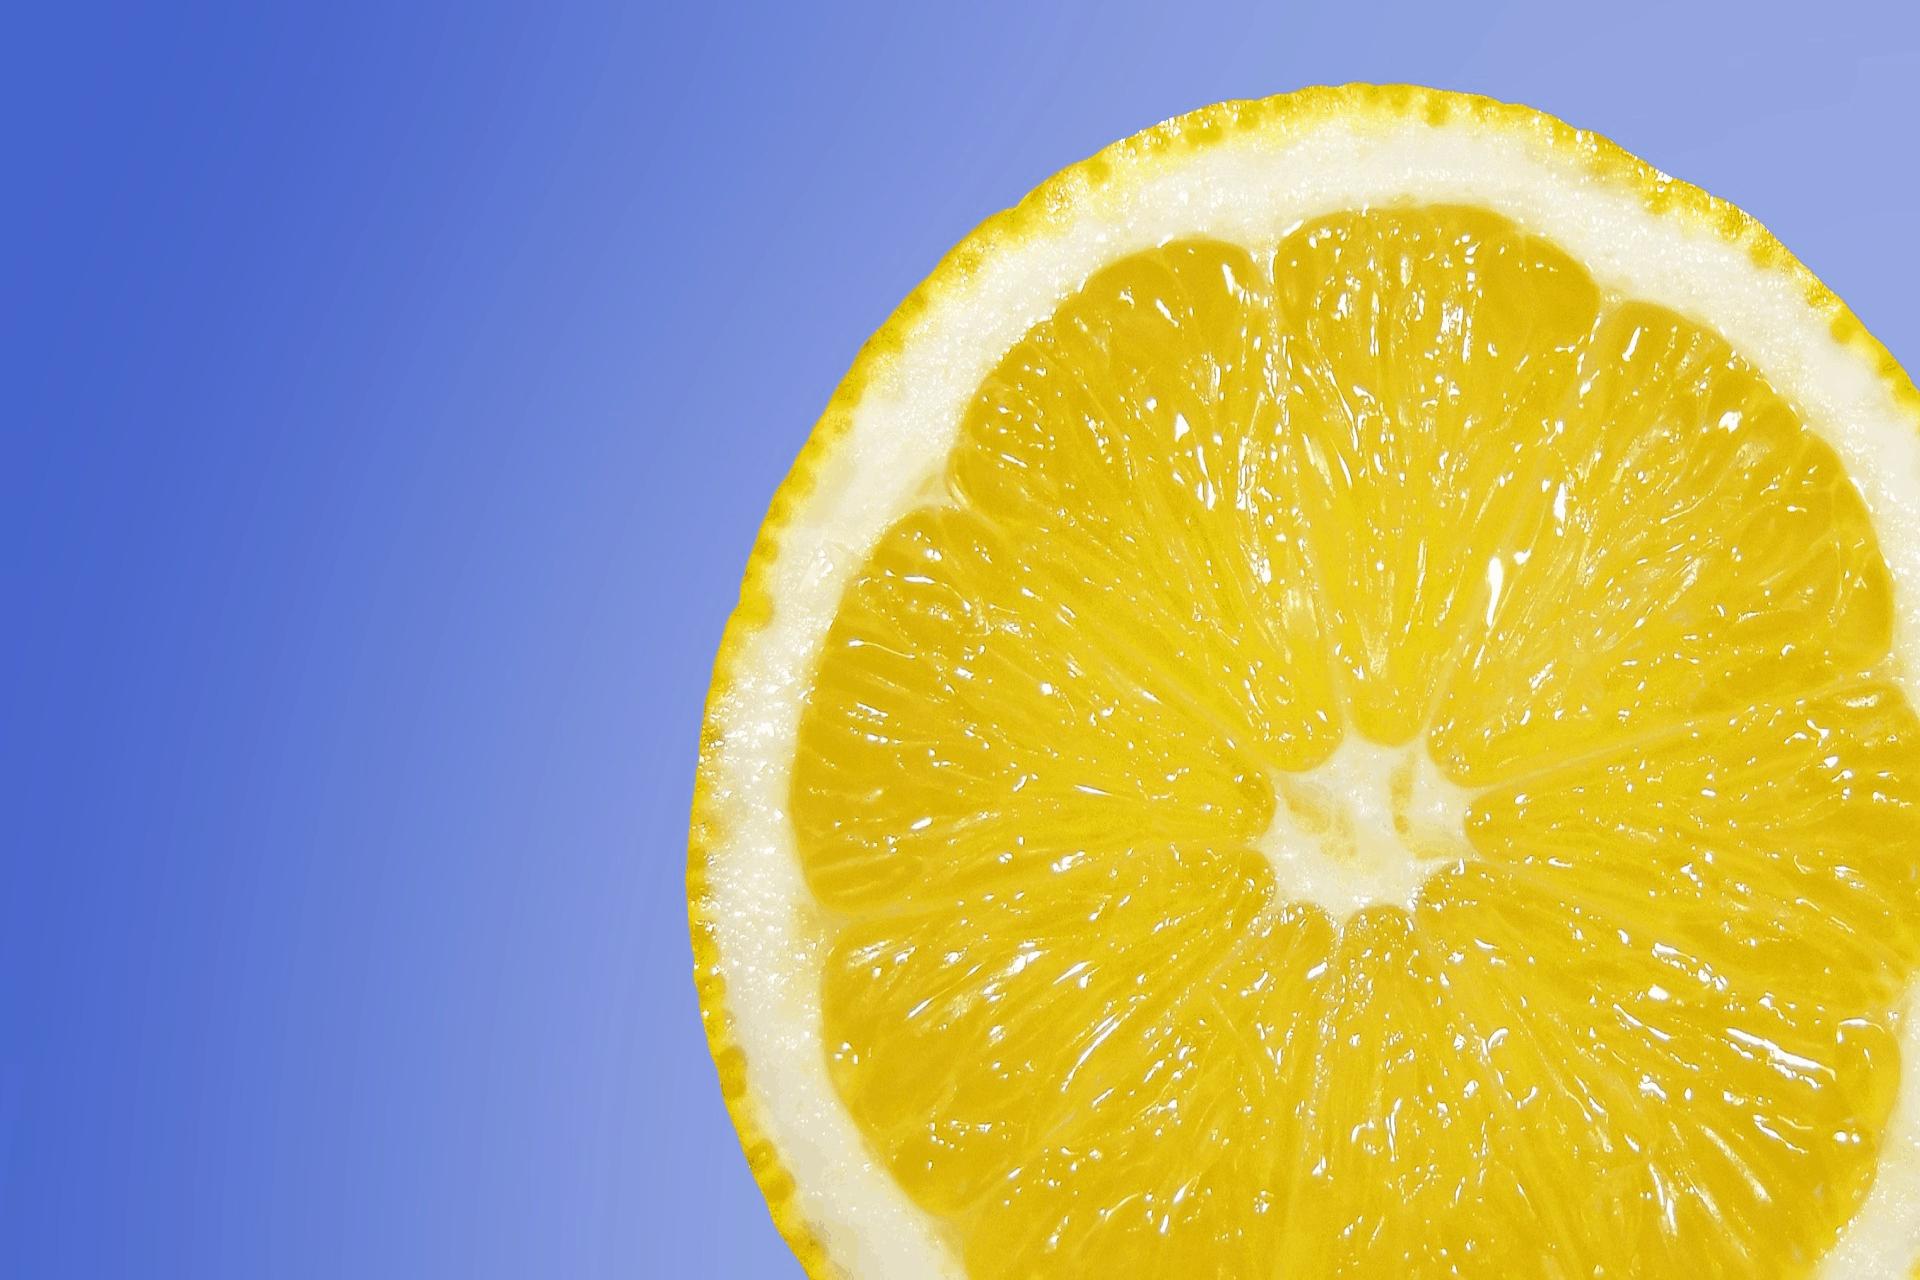 lemon 1024641 1920 1